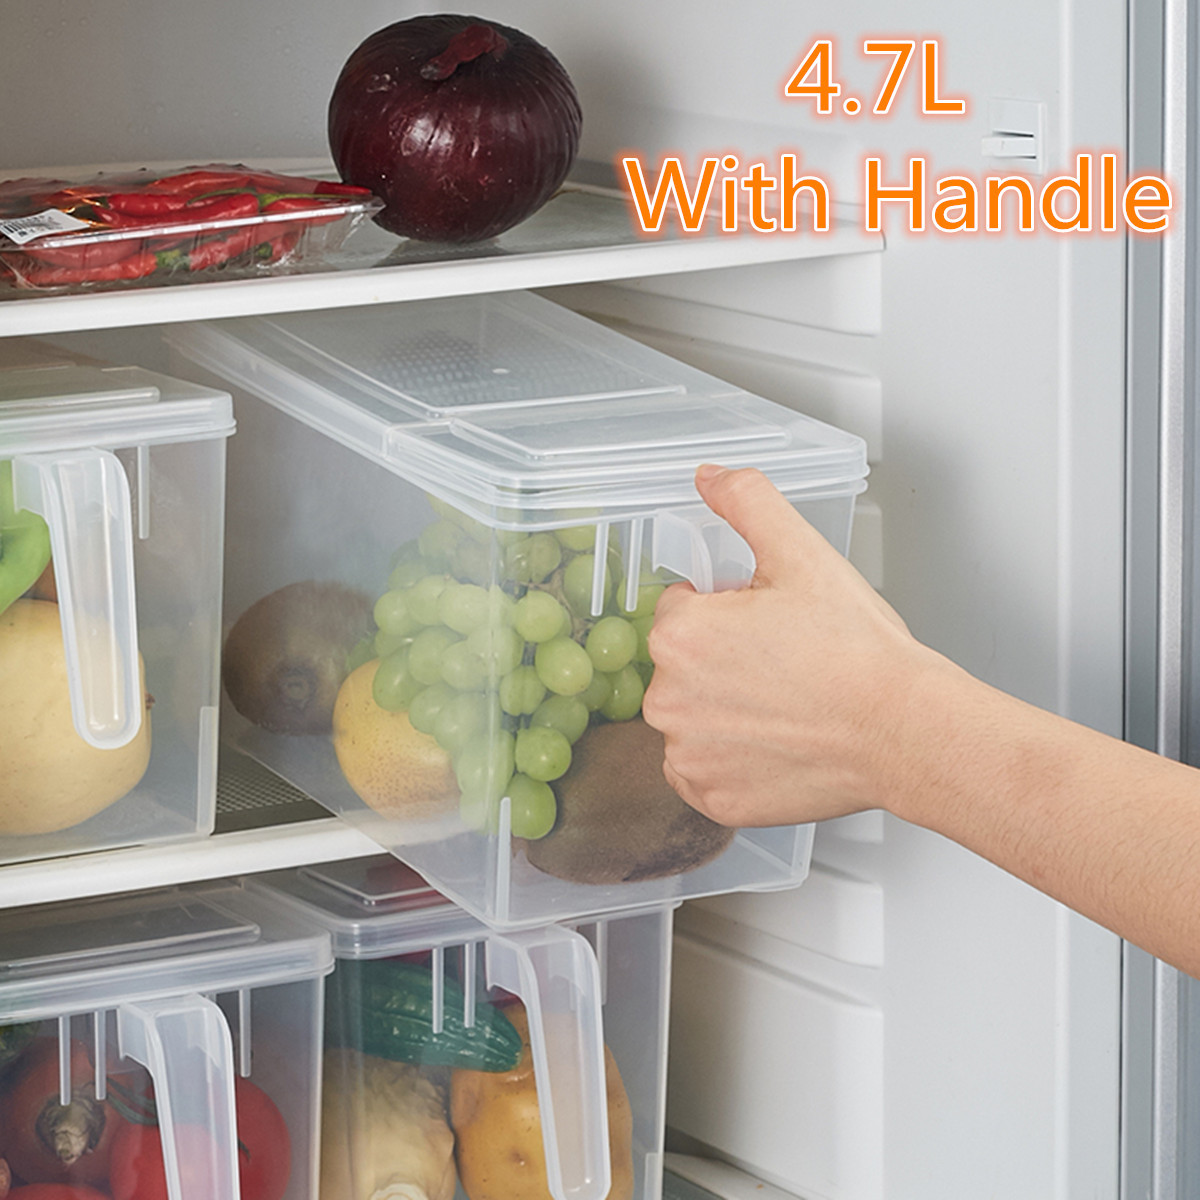 2PCS Refrigerator Food Storage Box Kitchen Sealed Plastic Crisper Case Container Organizer with Handle + Lid